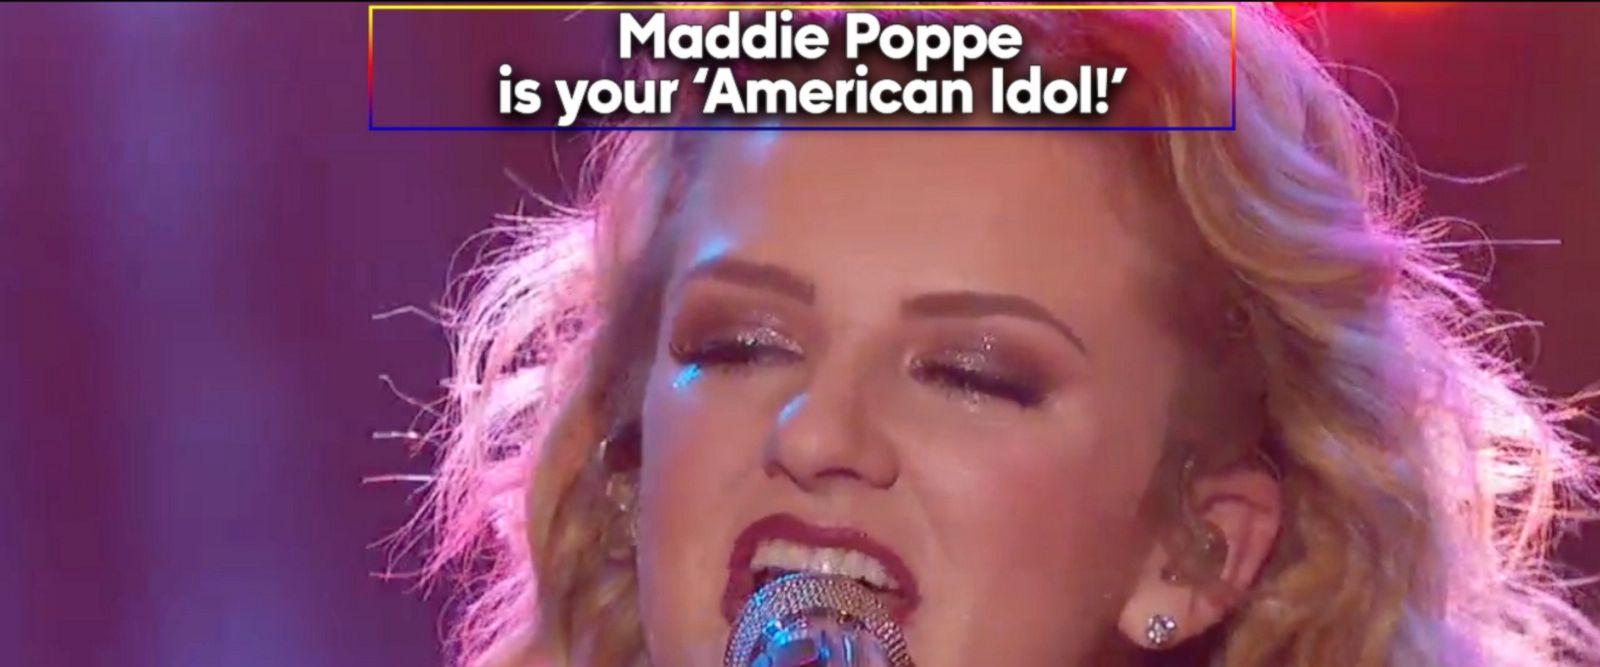 VIDEO: Congratulations, Maddie Poppe